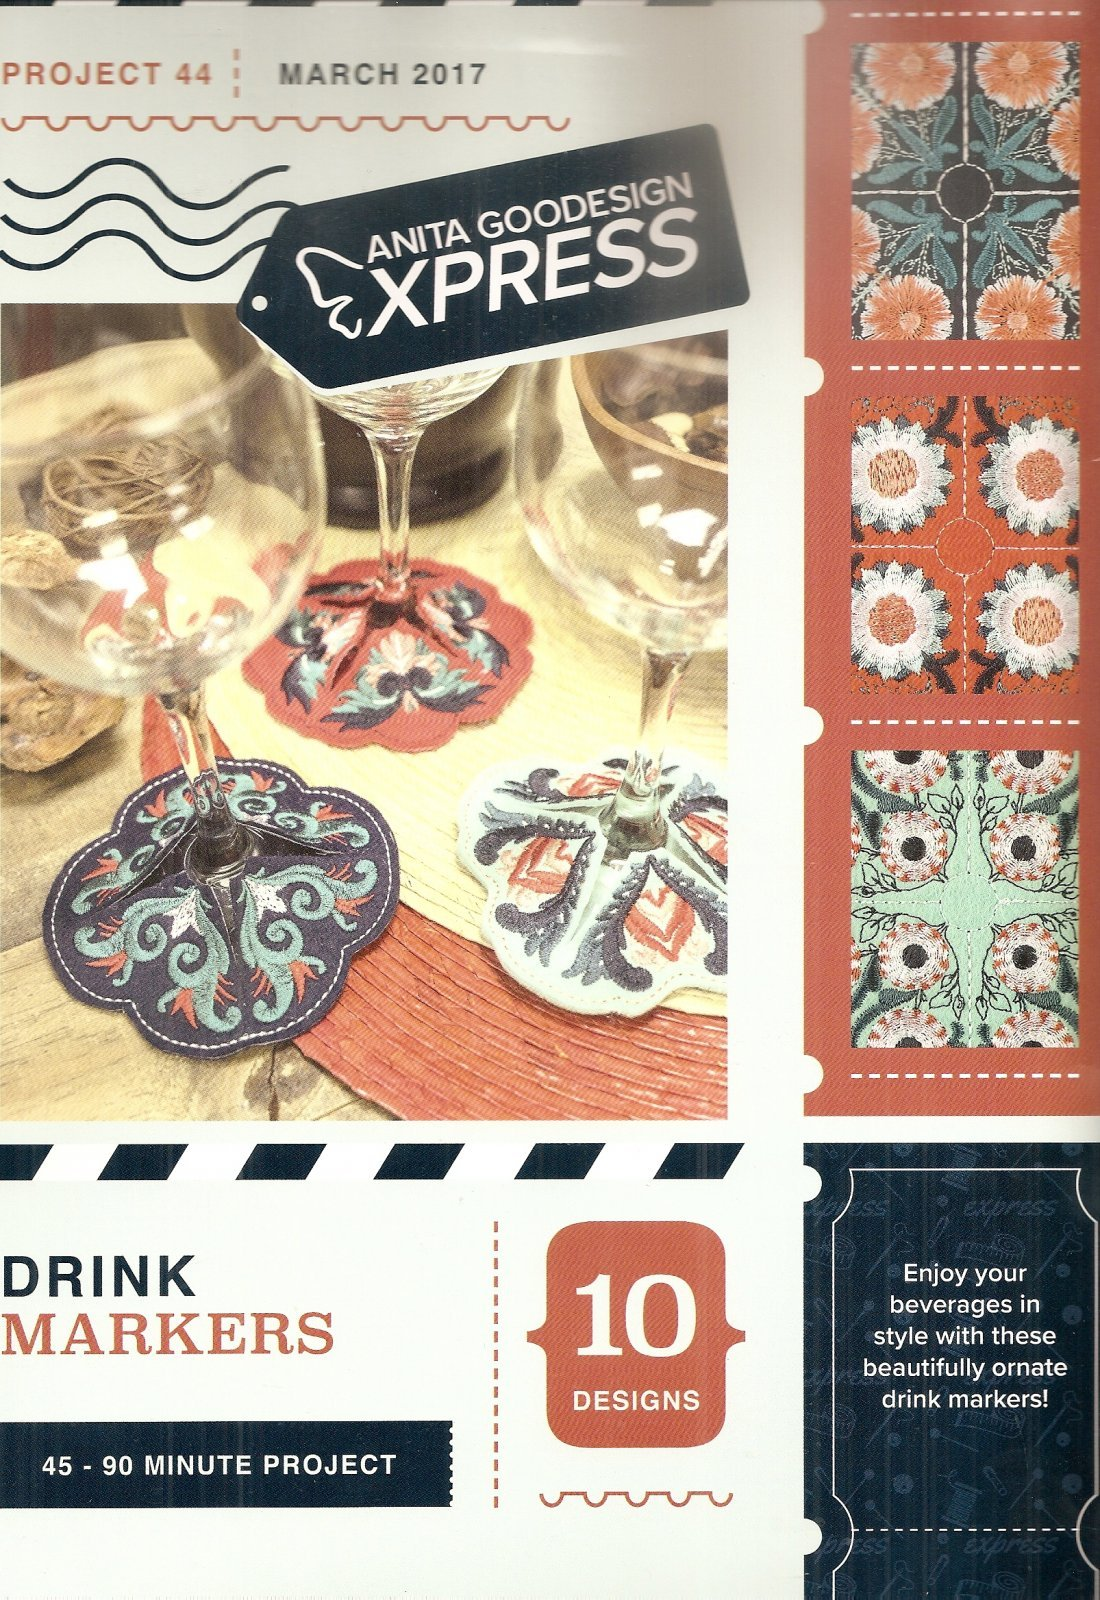 Anita goodesign embroidery club may